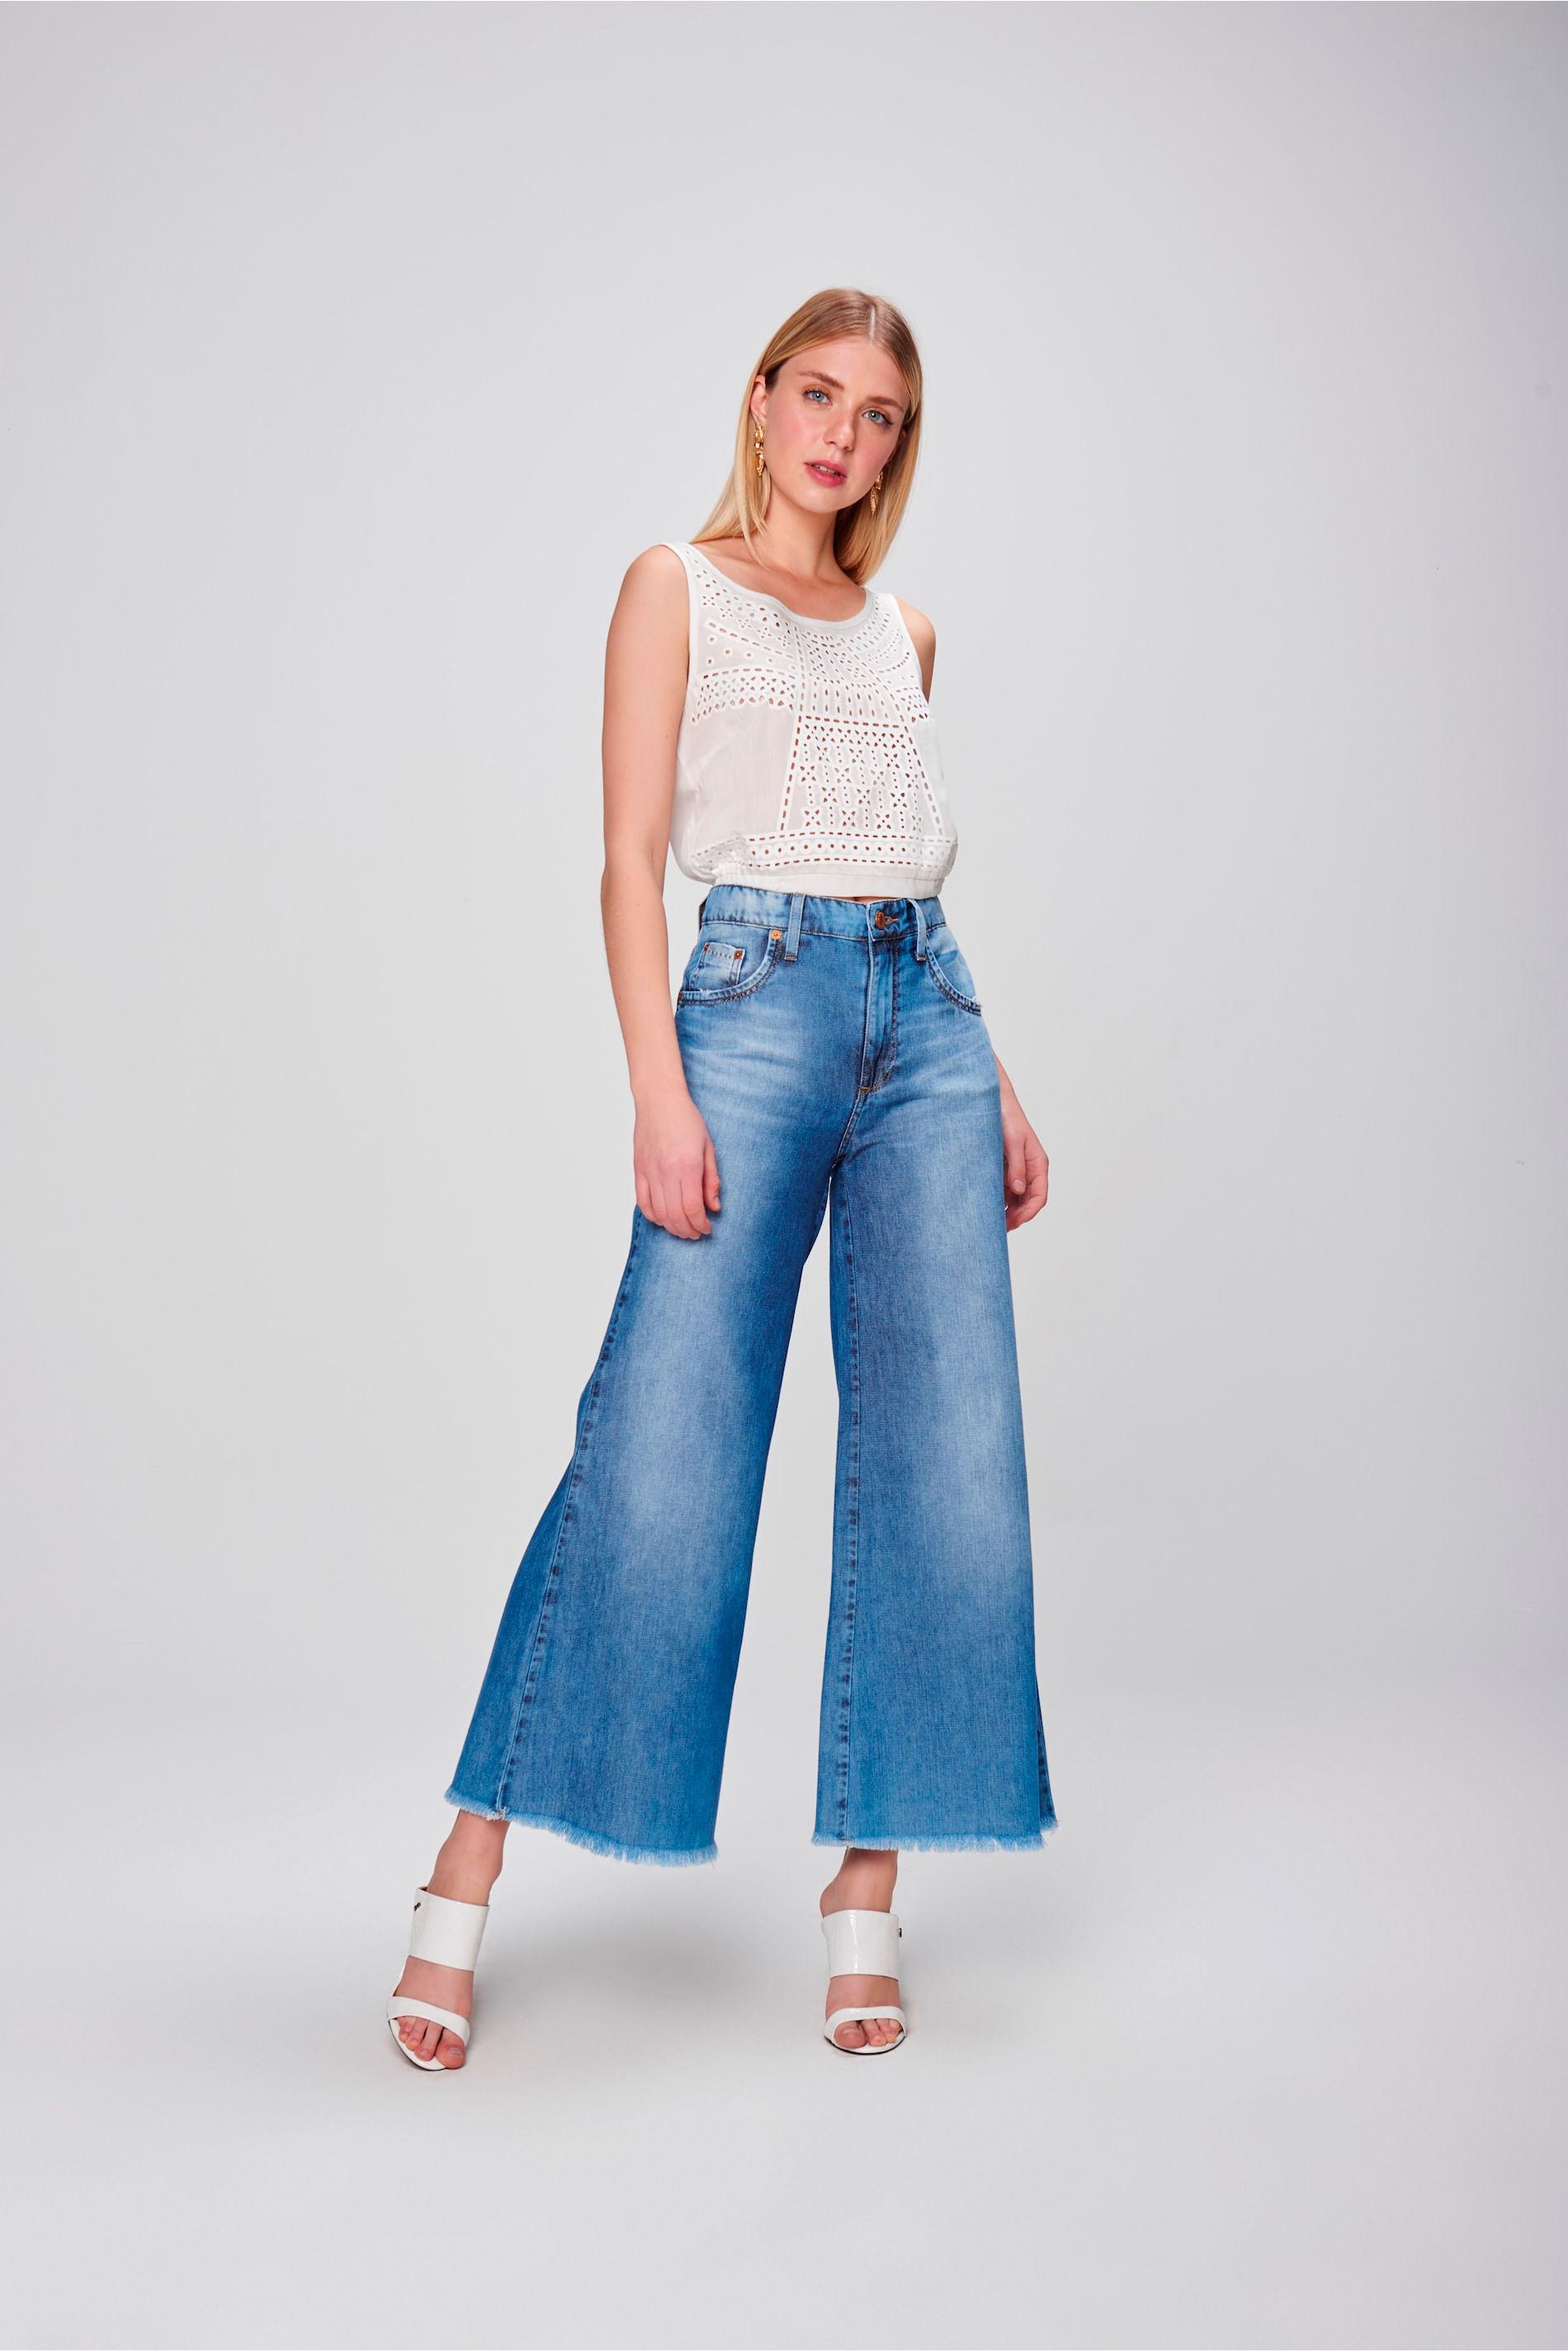 bd221680c Damyller · Moda Feminina · Calças · Pantalona. abrir